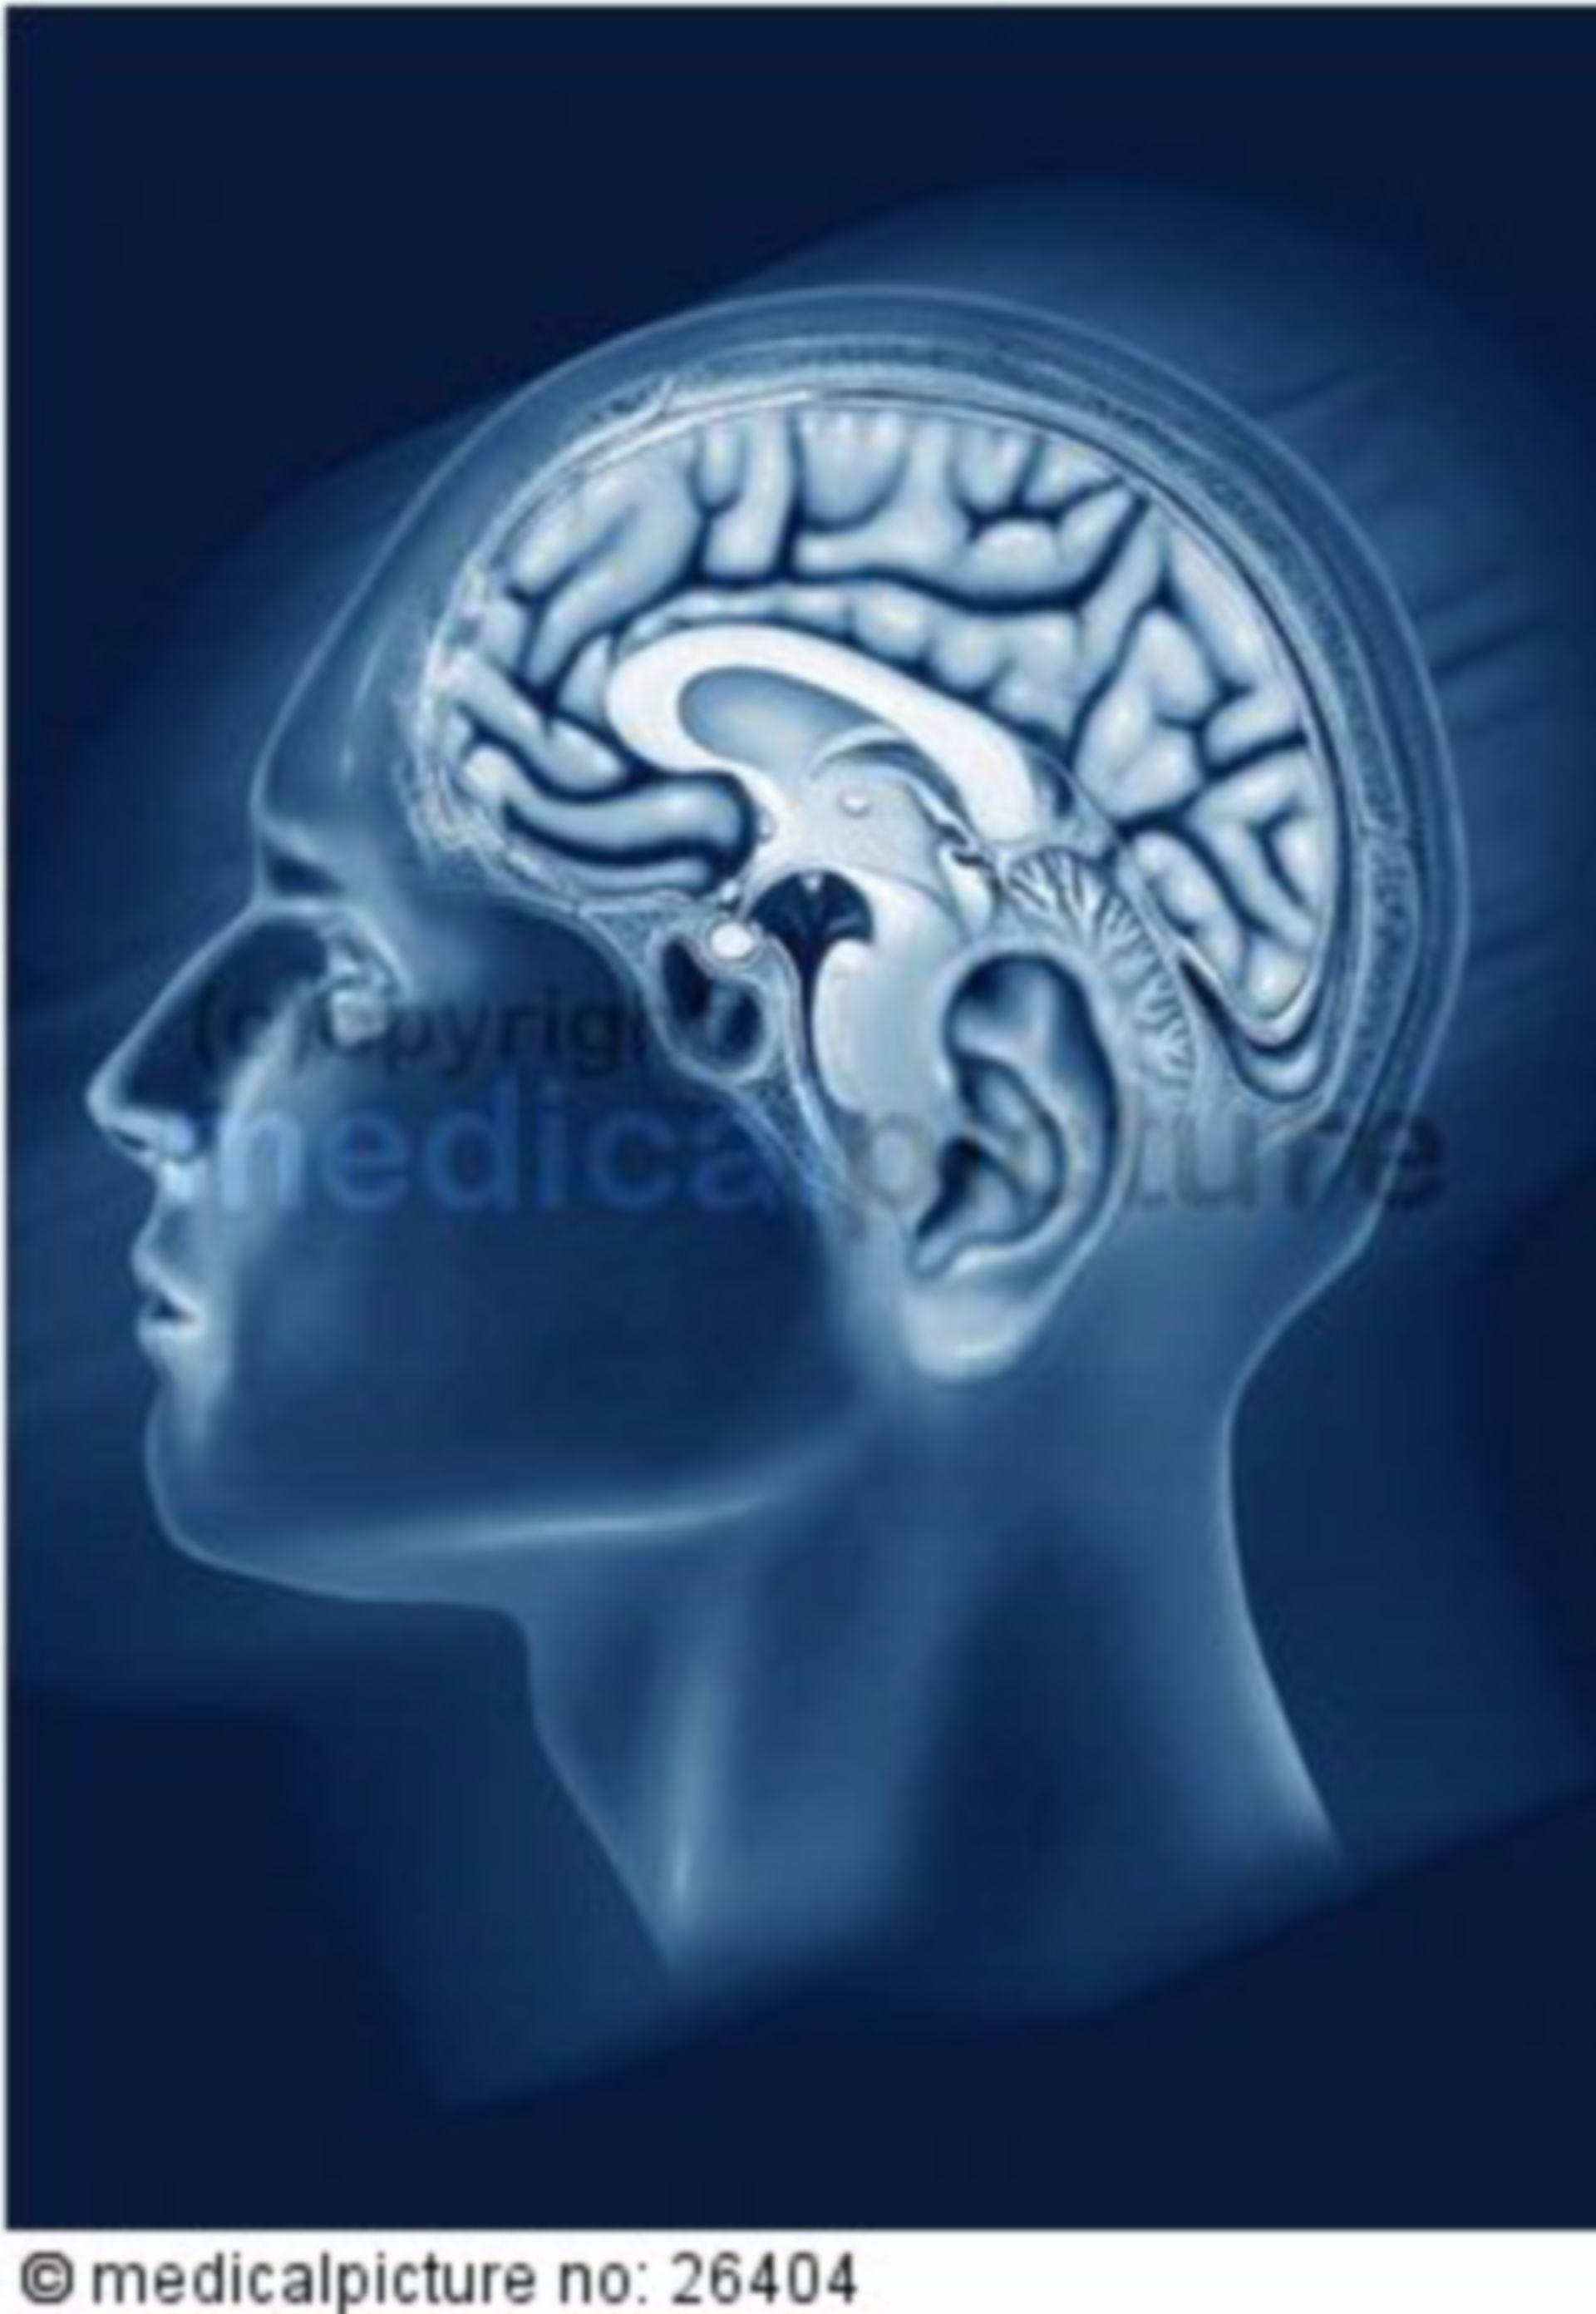 Gehirn in einfarbigem Kopf, brain in single-colored head